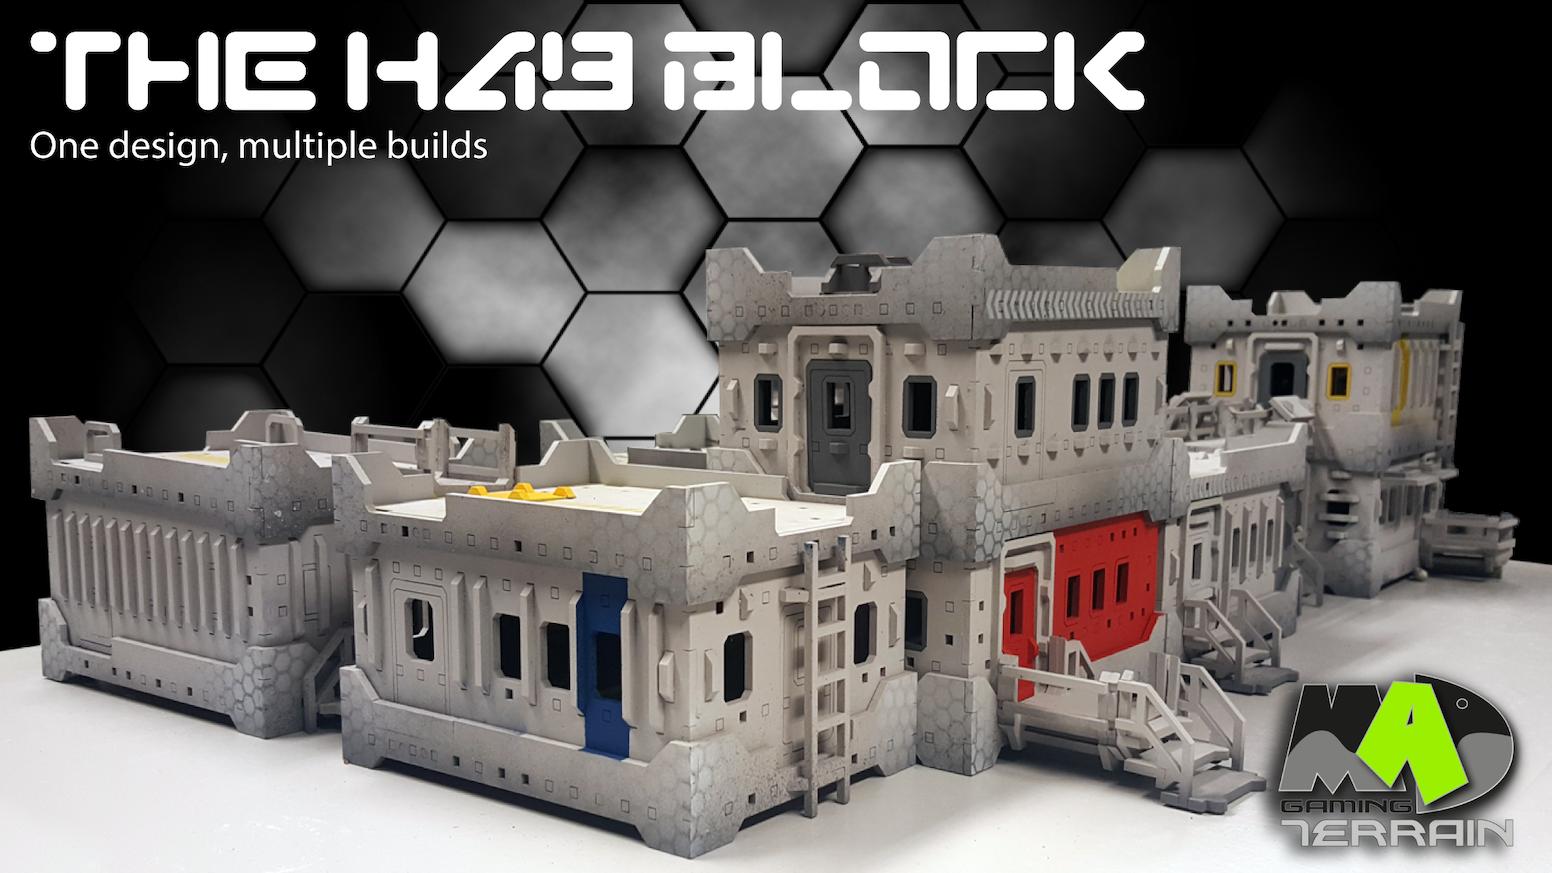 The Hab Block